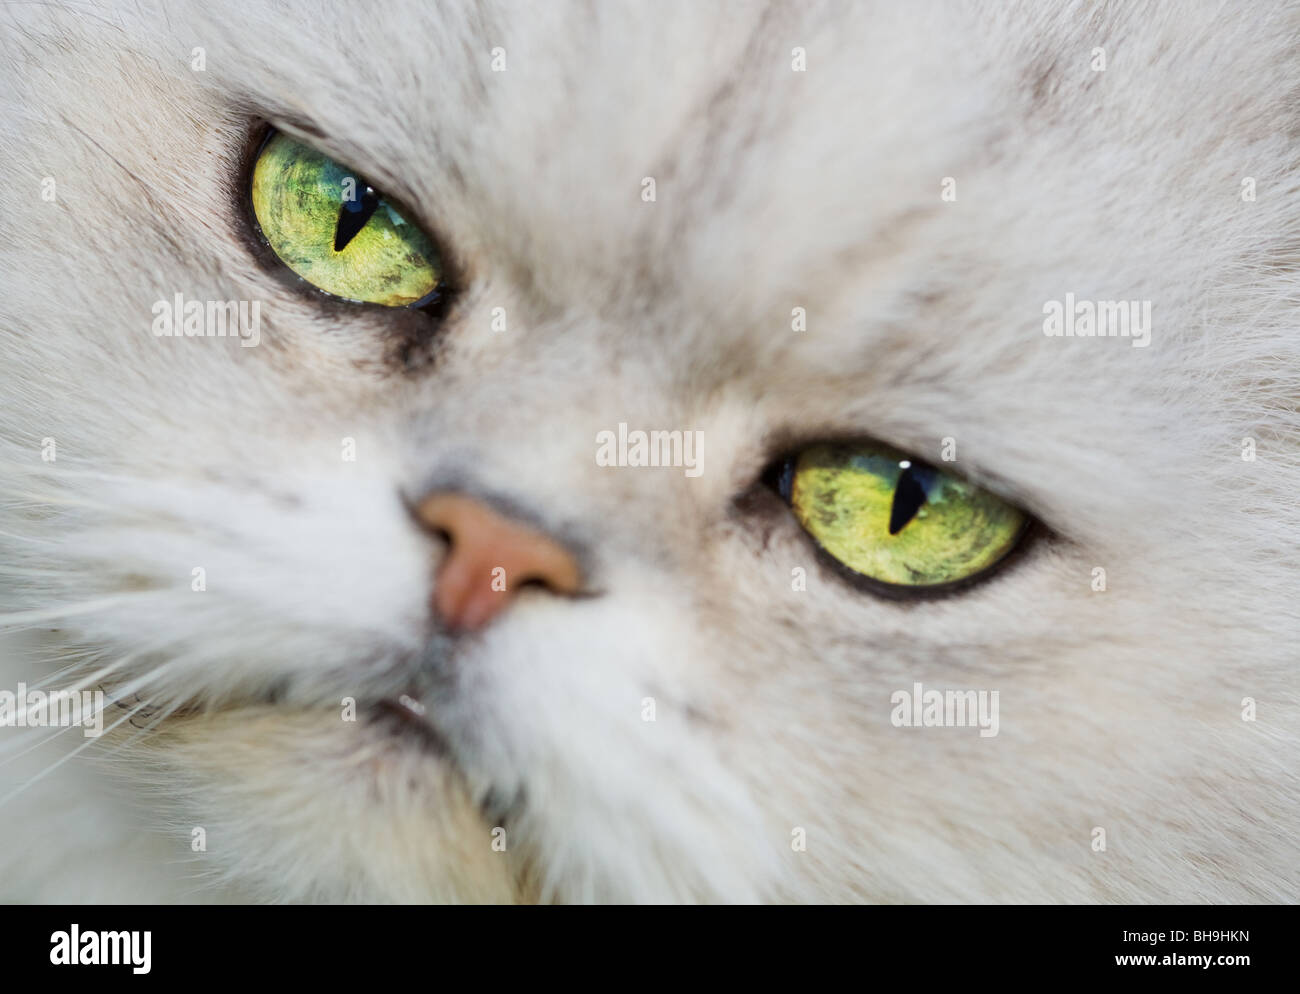 The Face of a White Persian Chinchilla Cat Stock Photo